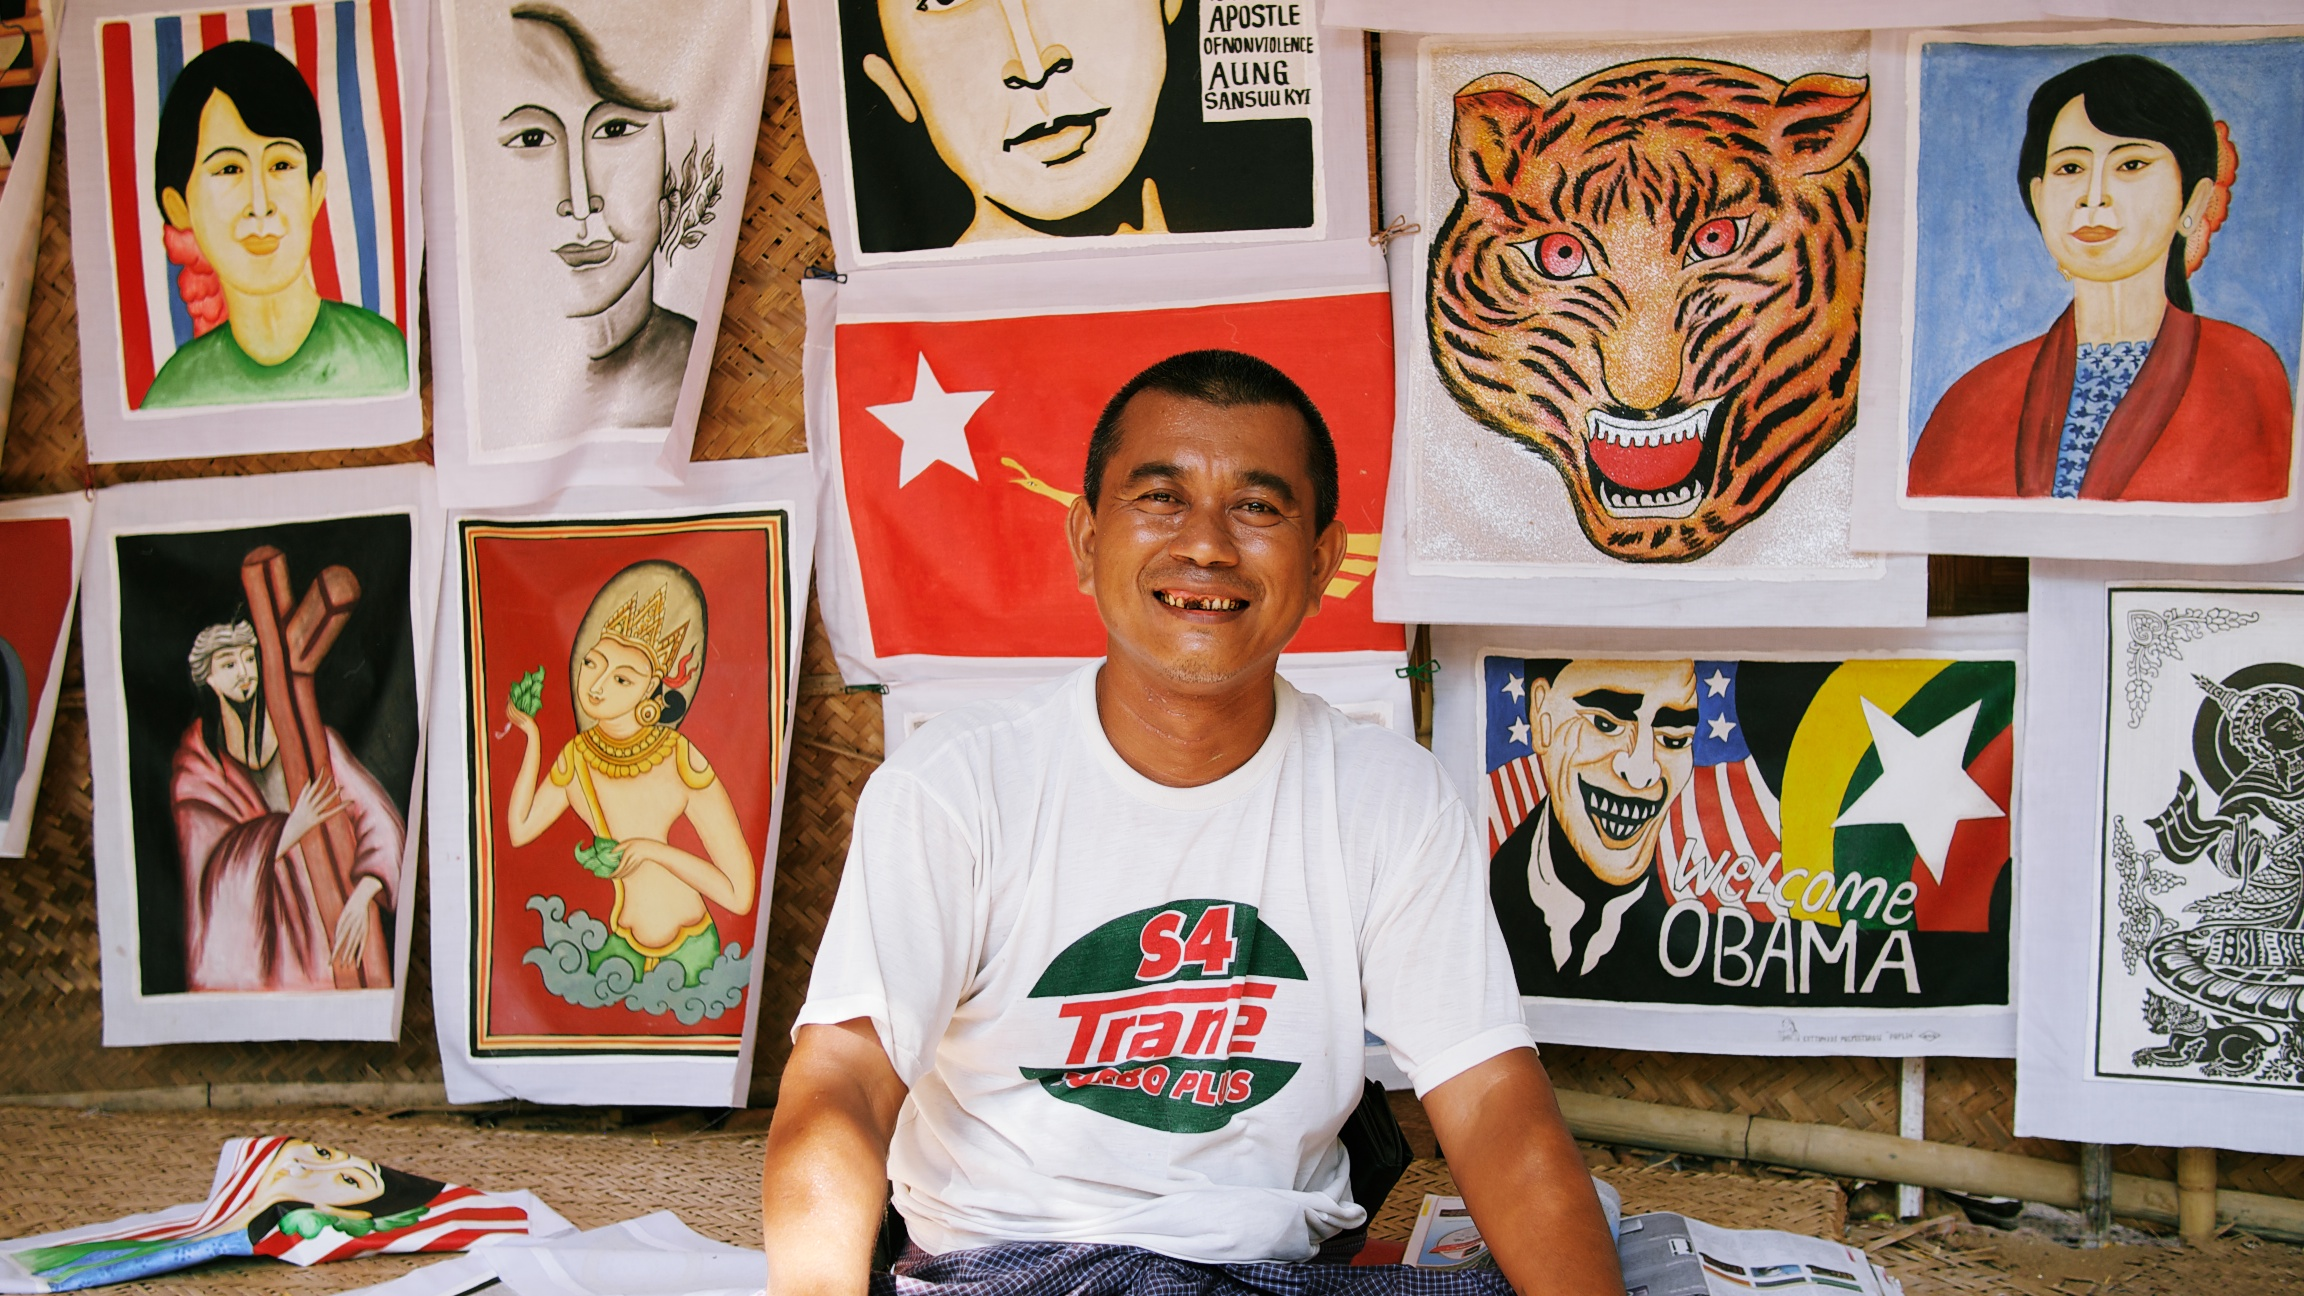 Our friend, Myint Aung, the artist